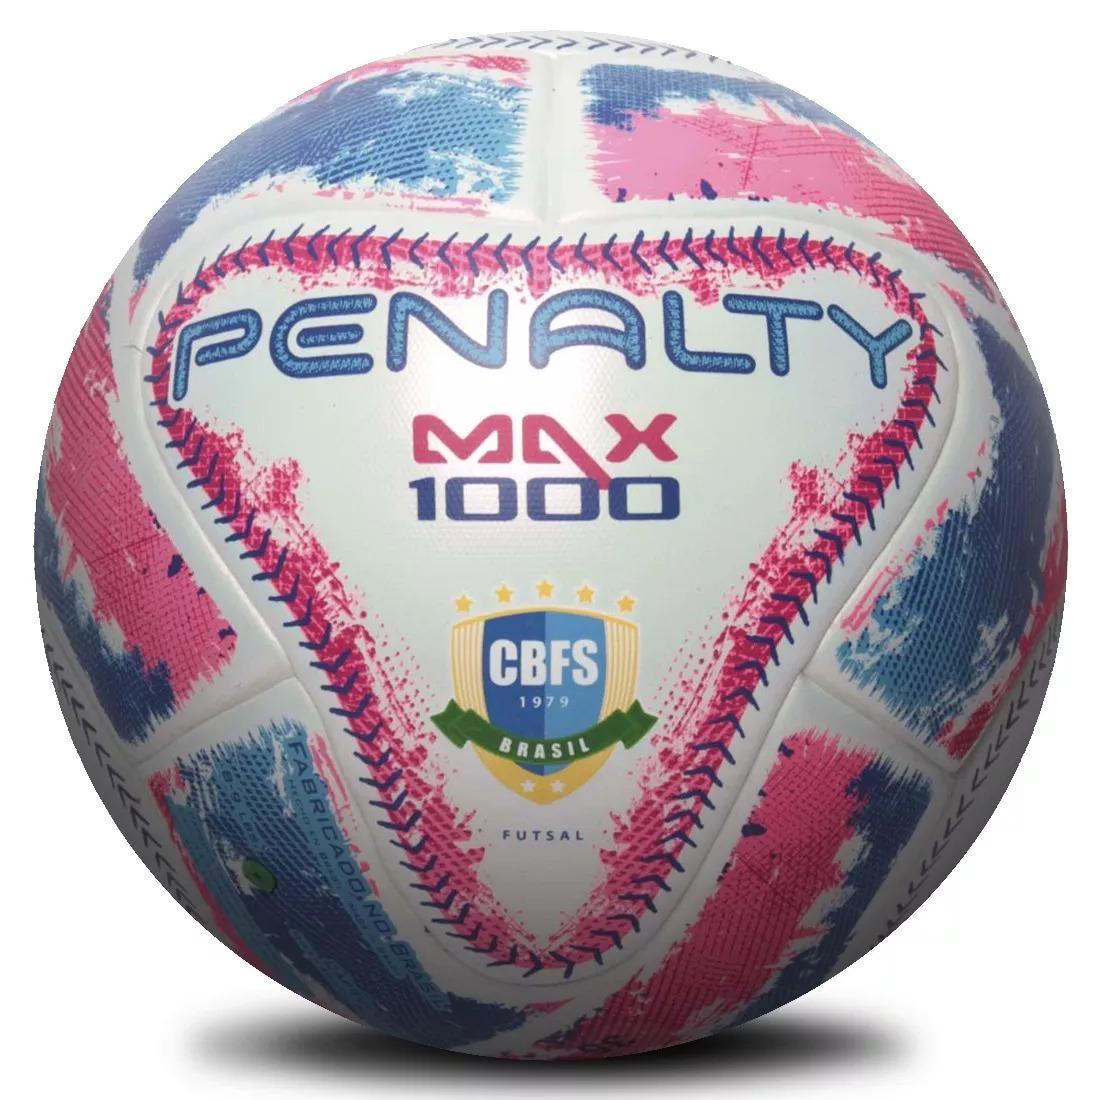 712555c42eecc bola futsal penalty max 1000 pró 7 - profissional - fifa. Carregando zoom.